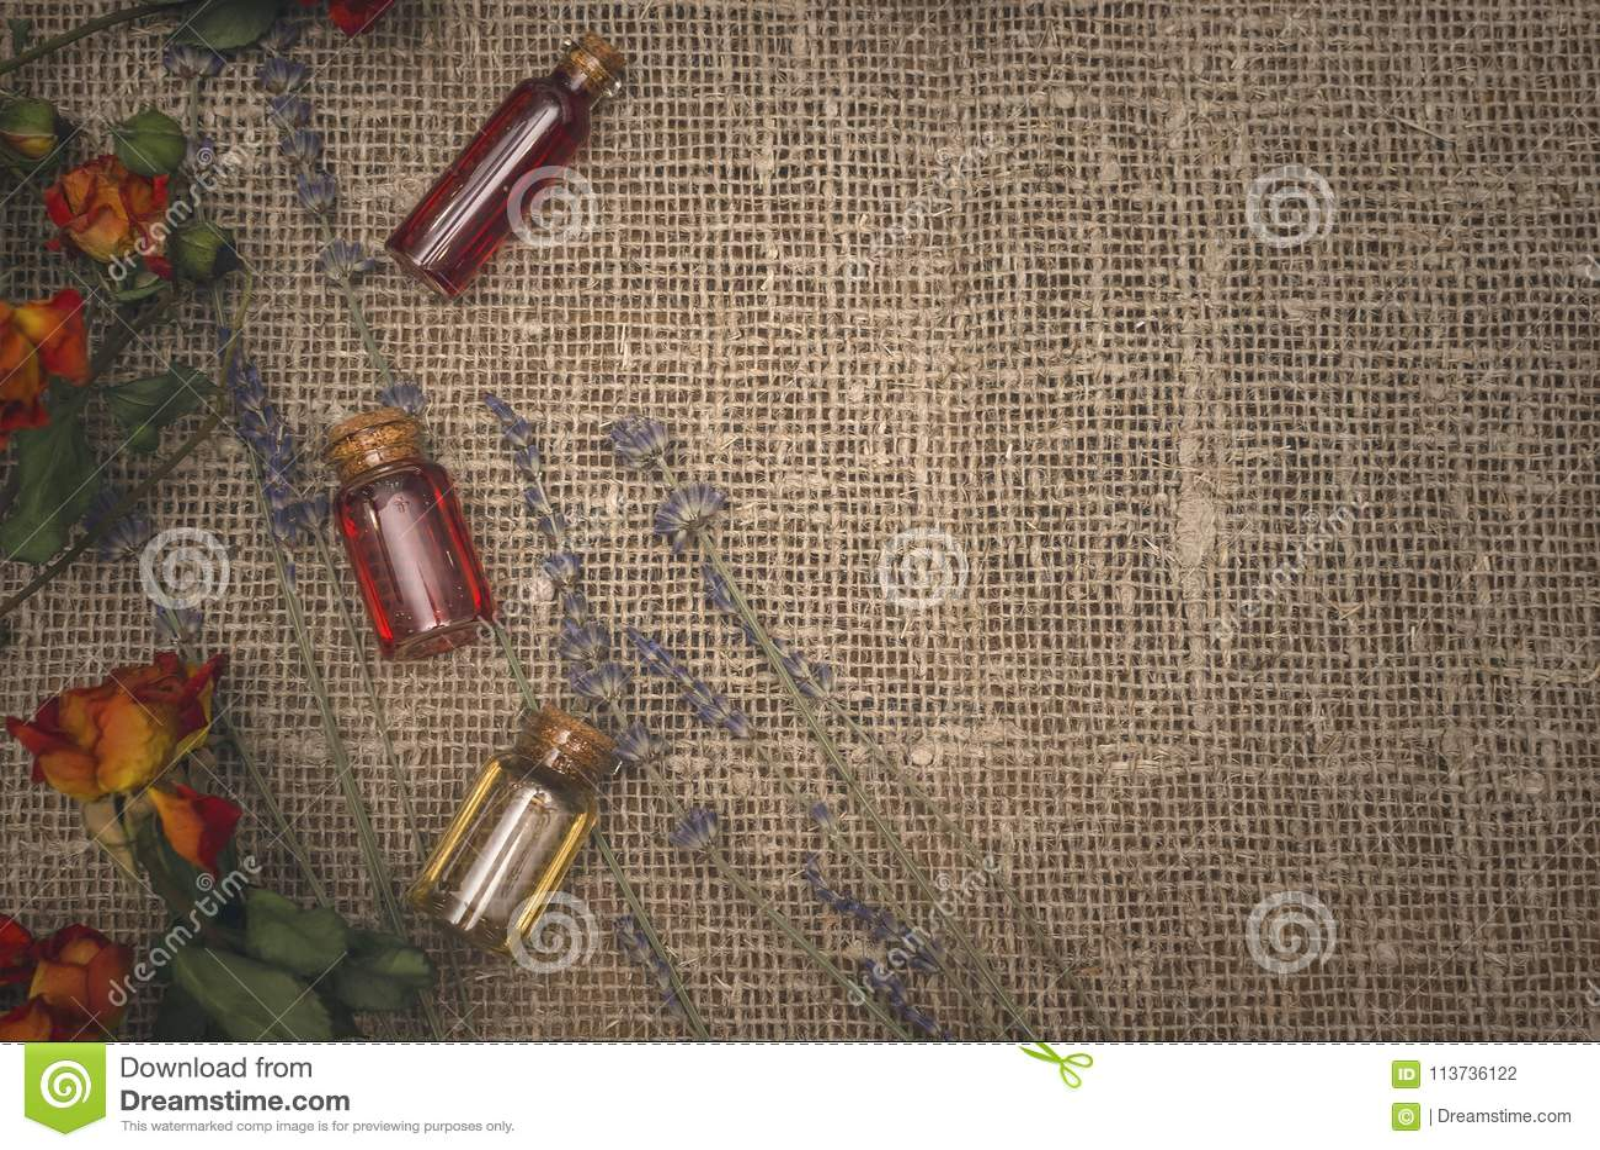 Herbal medicine. Alternative medicine. Essential oil tincture bottles.